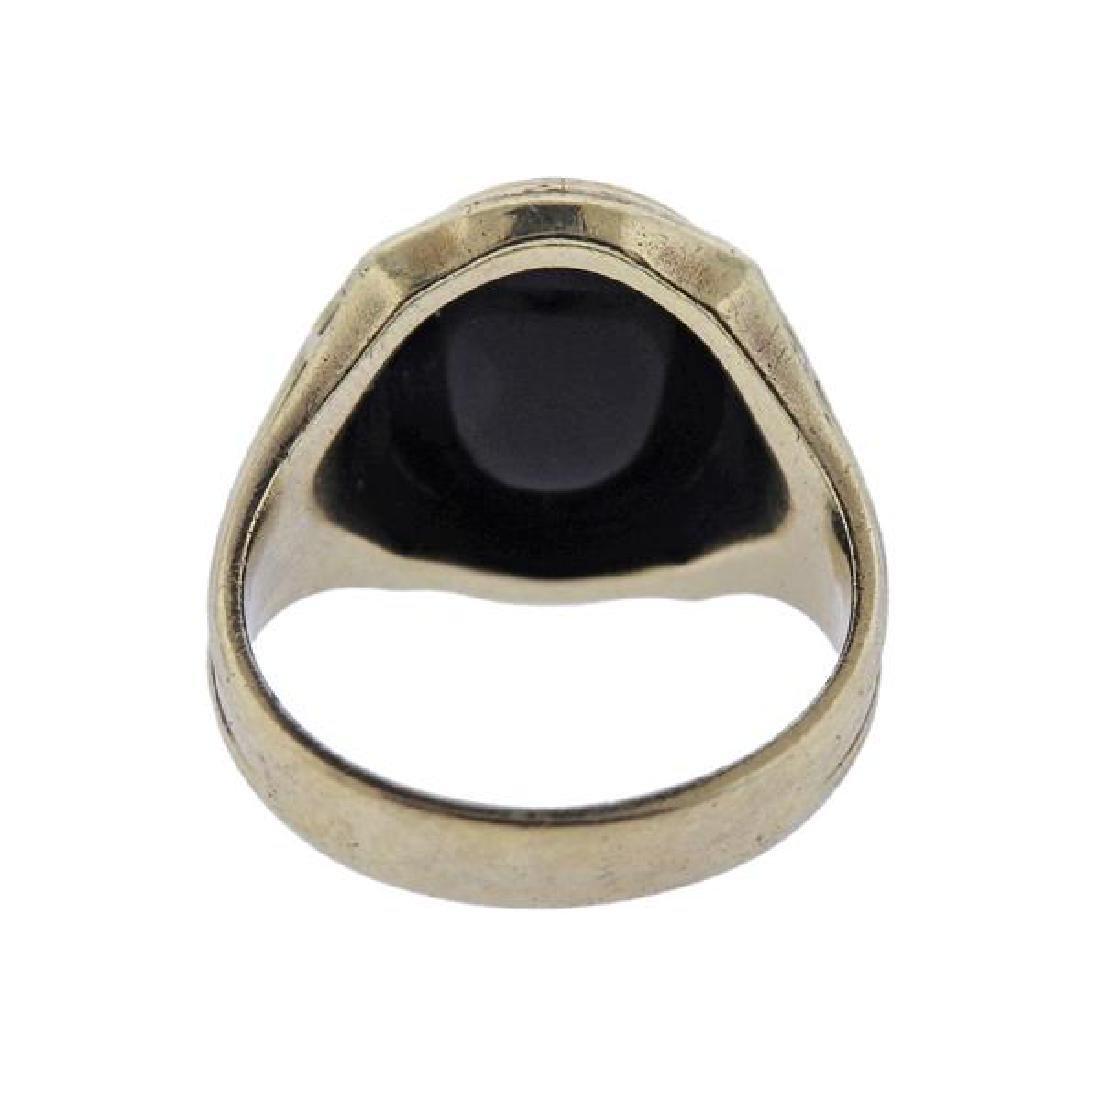 Art Deco 10k Gold Onyx Ring - 3